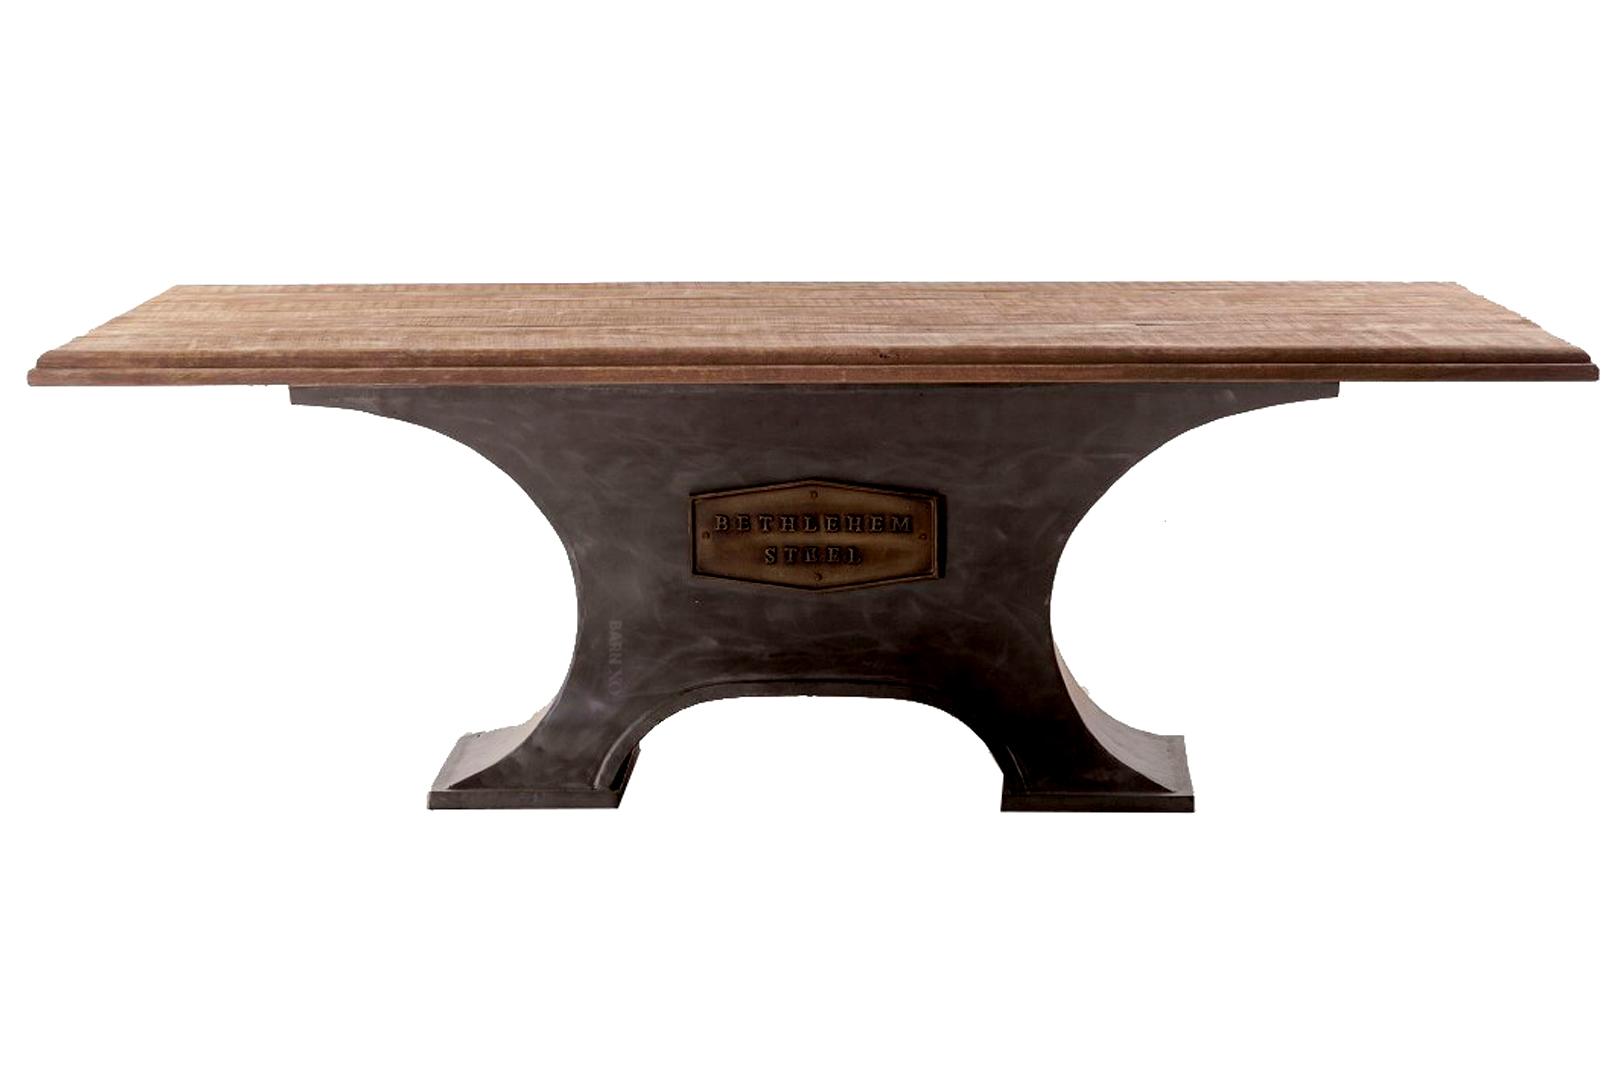 Repurposed Wooden Furniture | Barnwood Furnishings | Beds | Desks ...